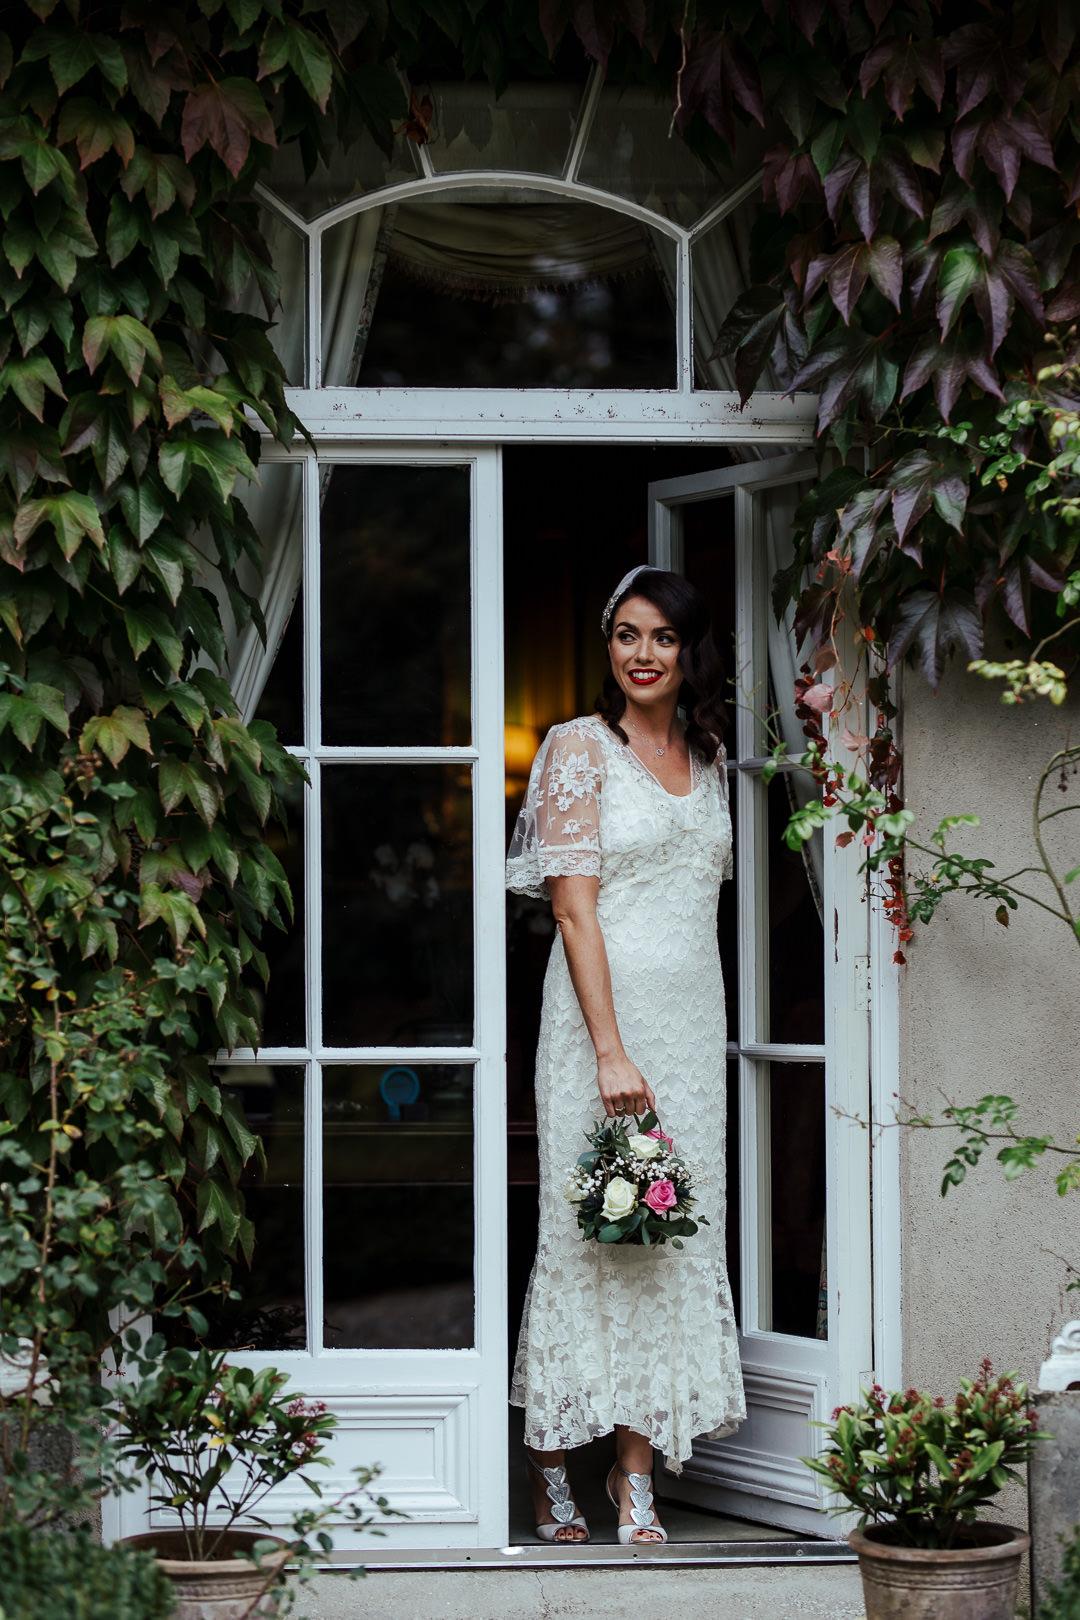 marlfield house wedding (11 of 189).jpg